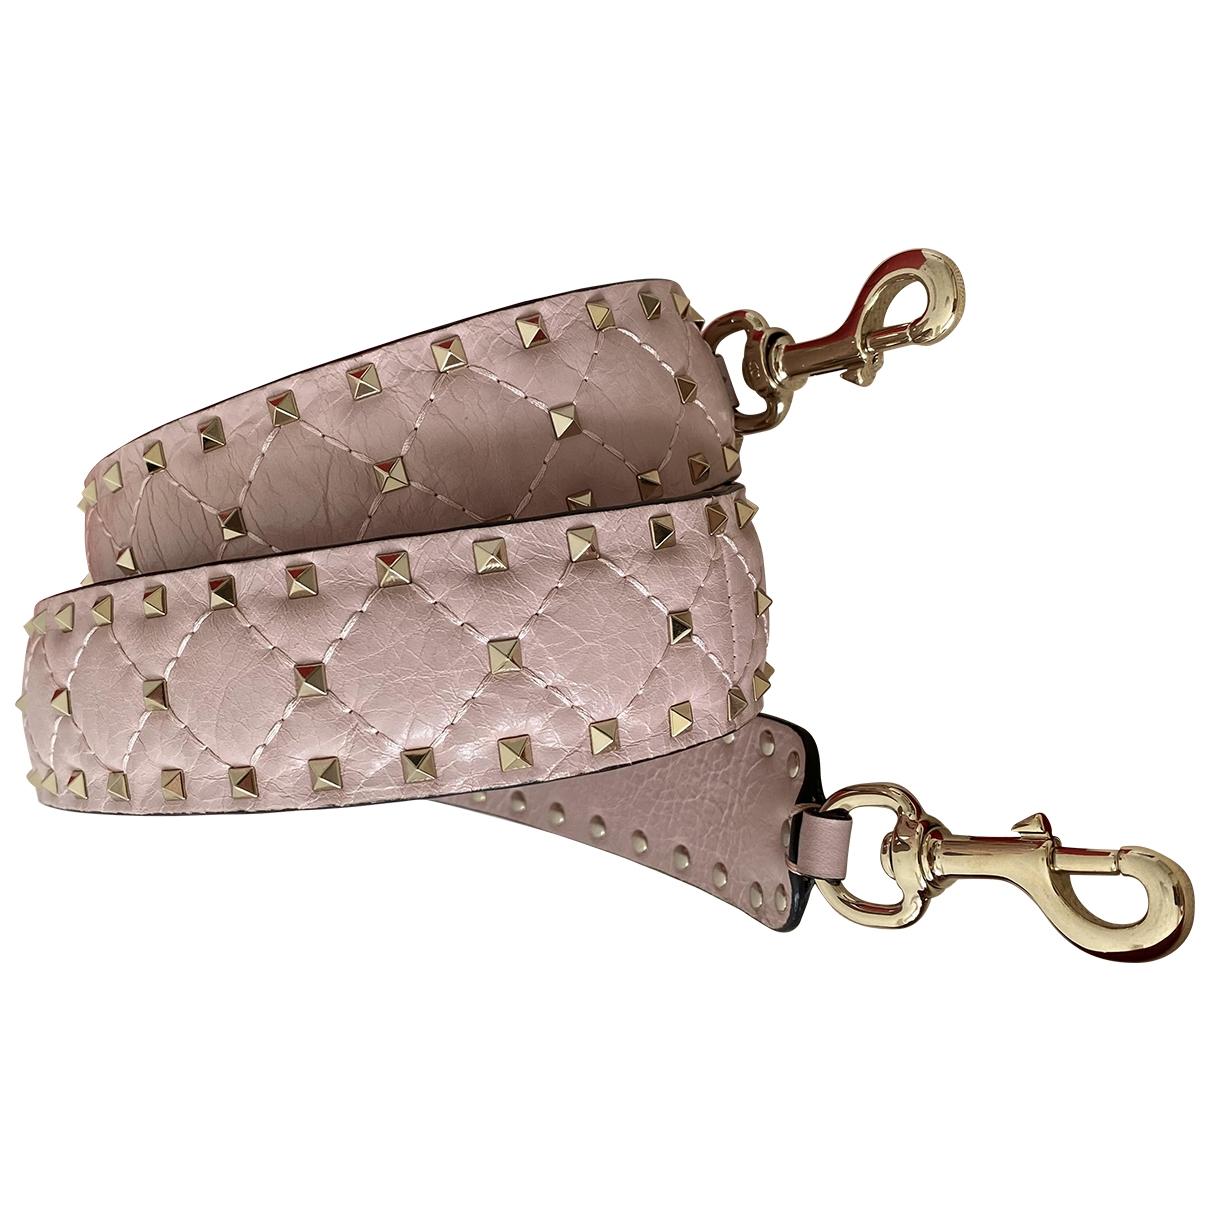 Valentino Garavani - Petite maroquinerie   pour femme en cuir - rose